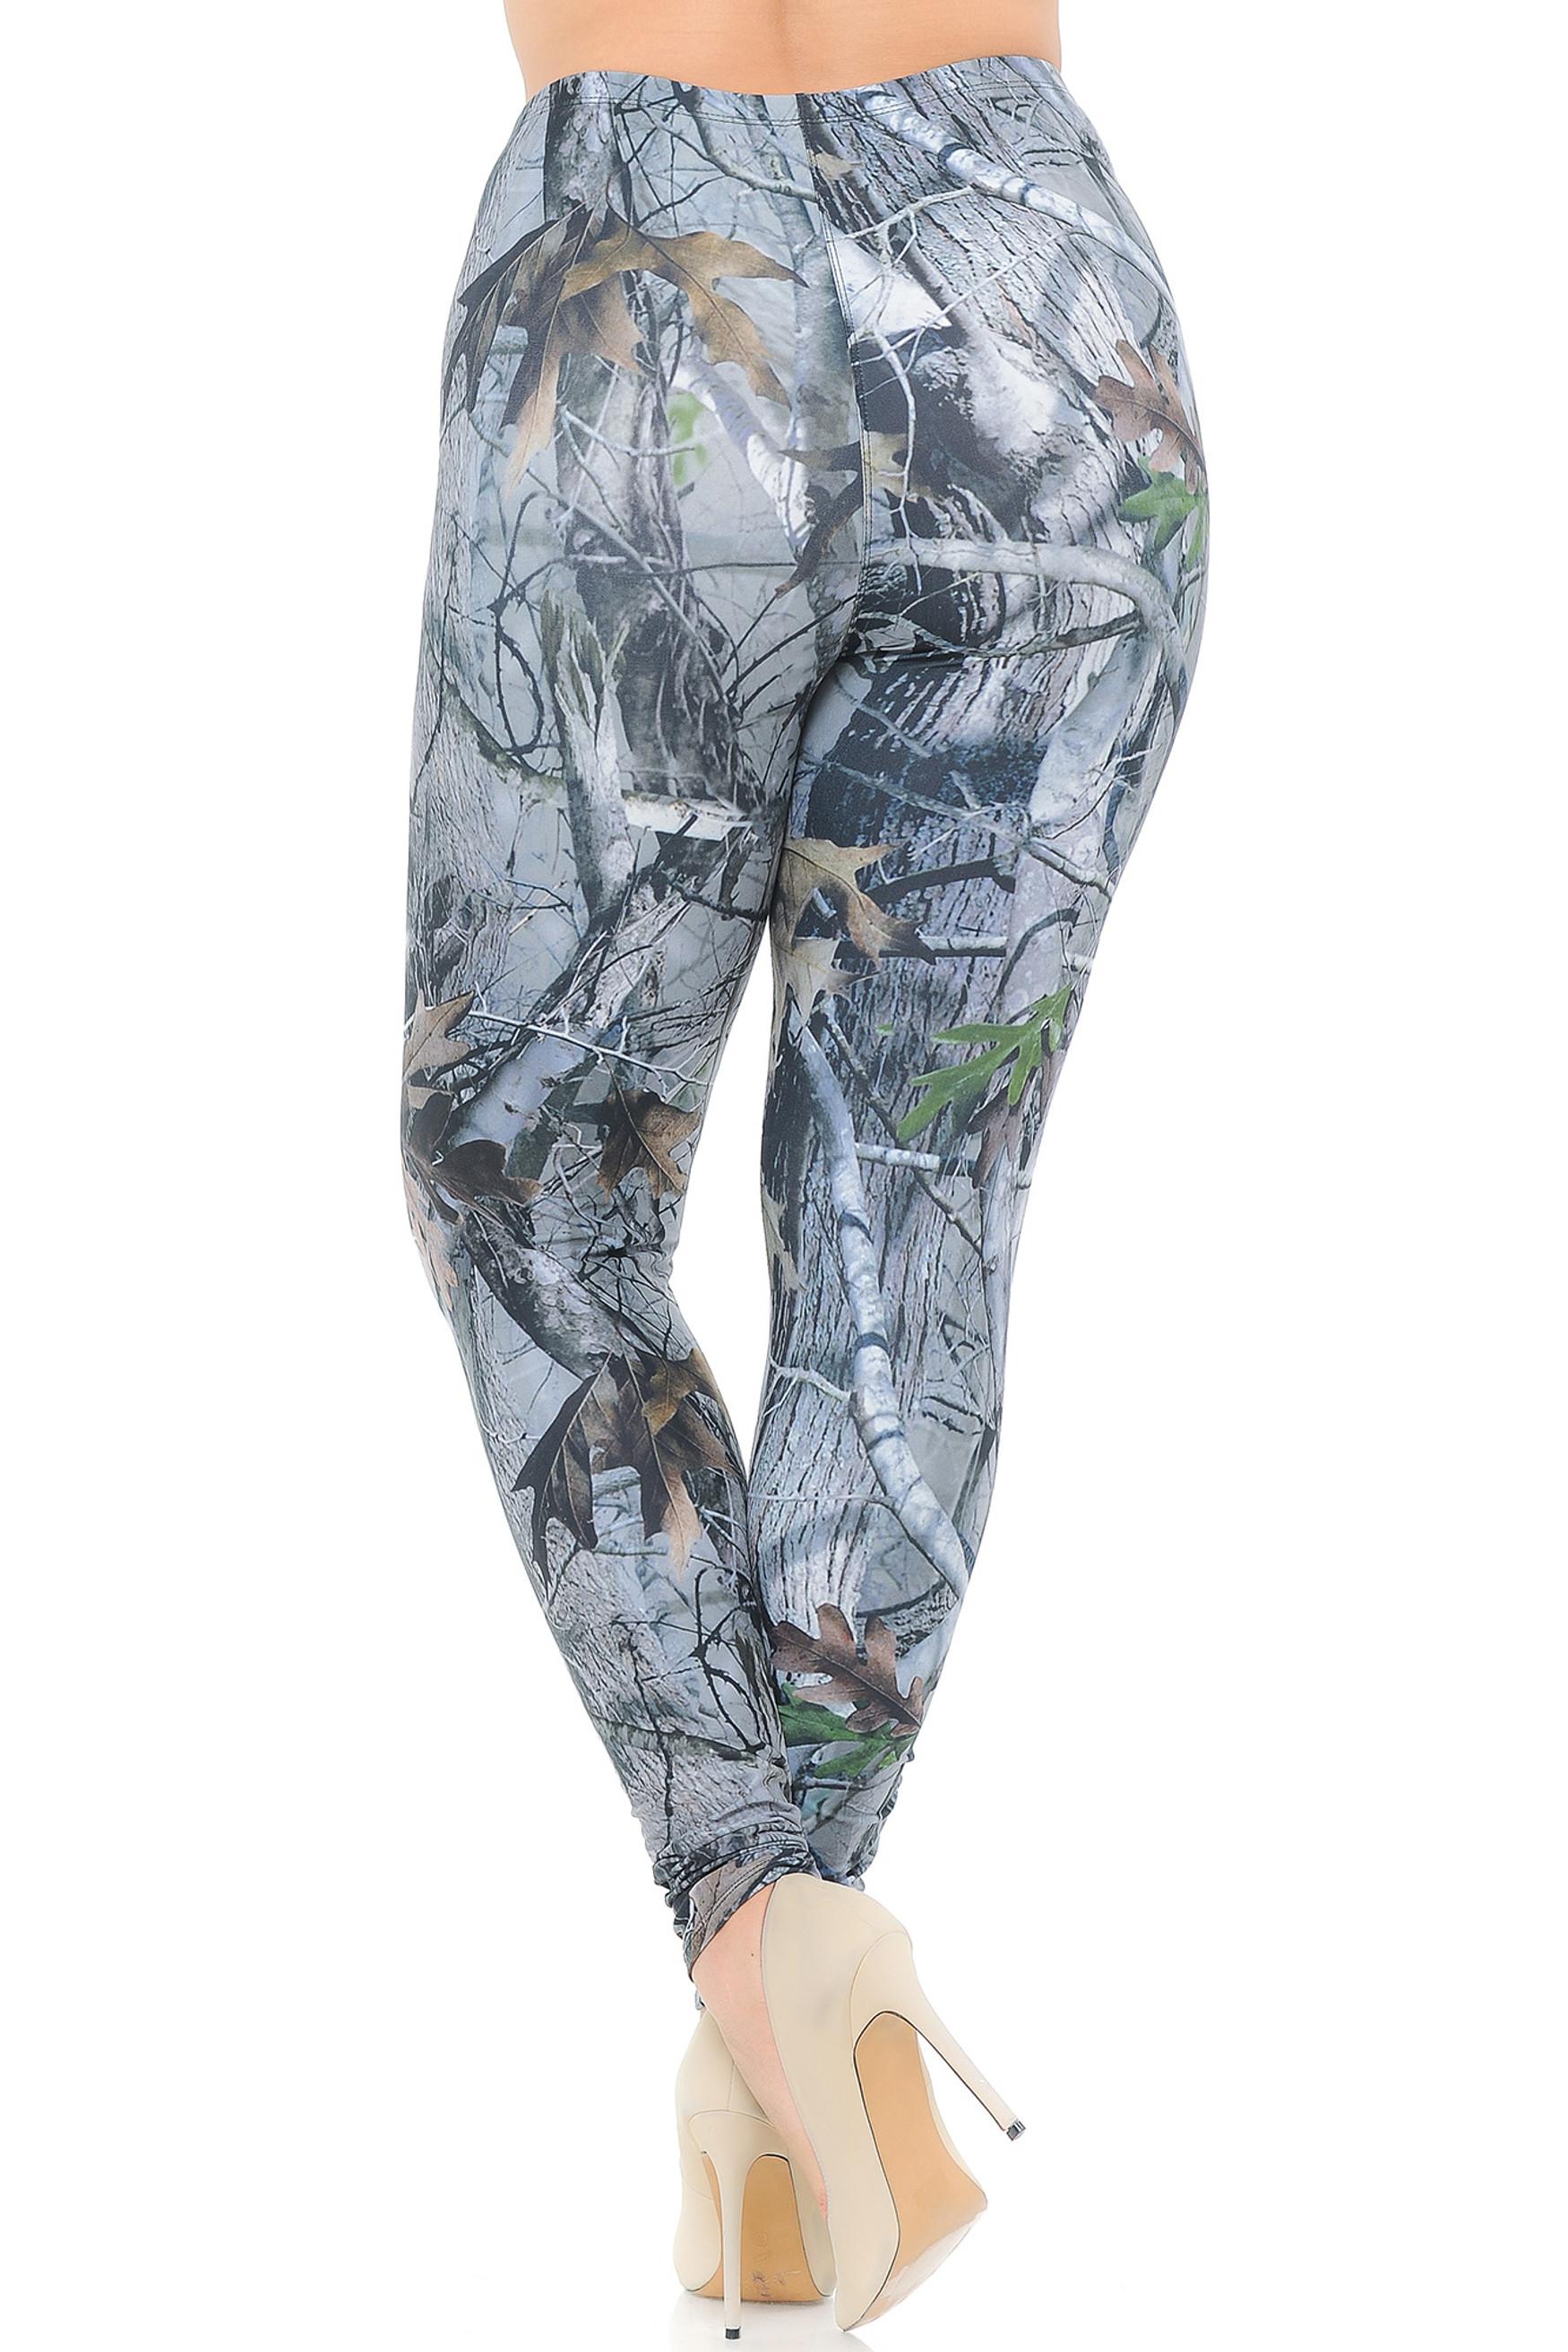 Creamy Soft Camouflage Trees Extra Plus Size Leggings - 3X-5X - USA Fashion™